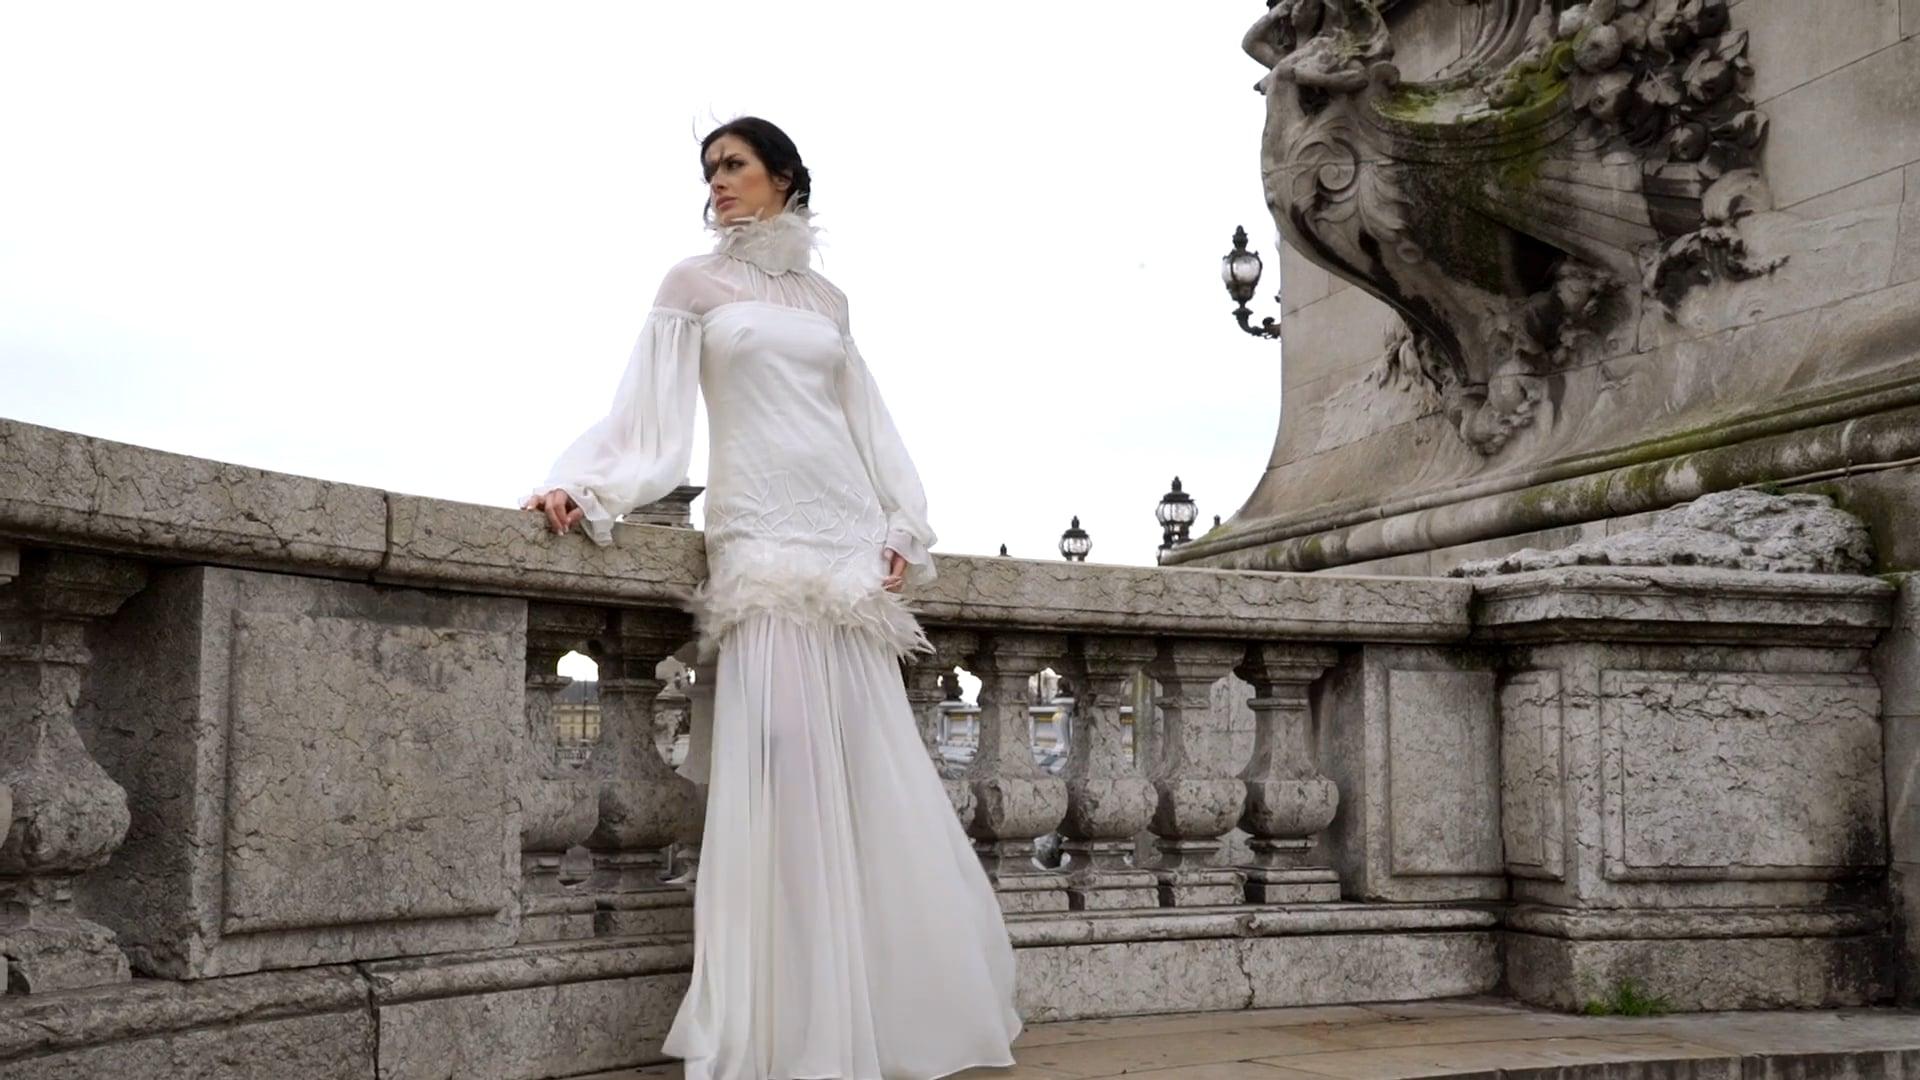 Alkmini Paris collection